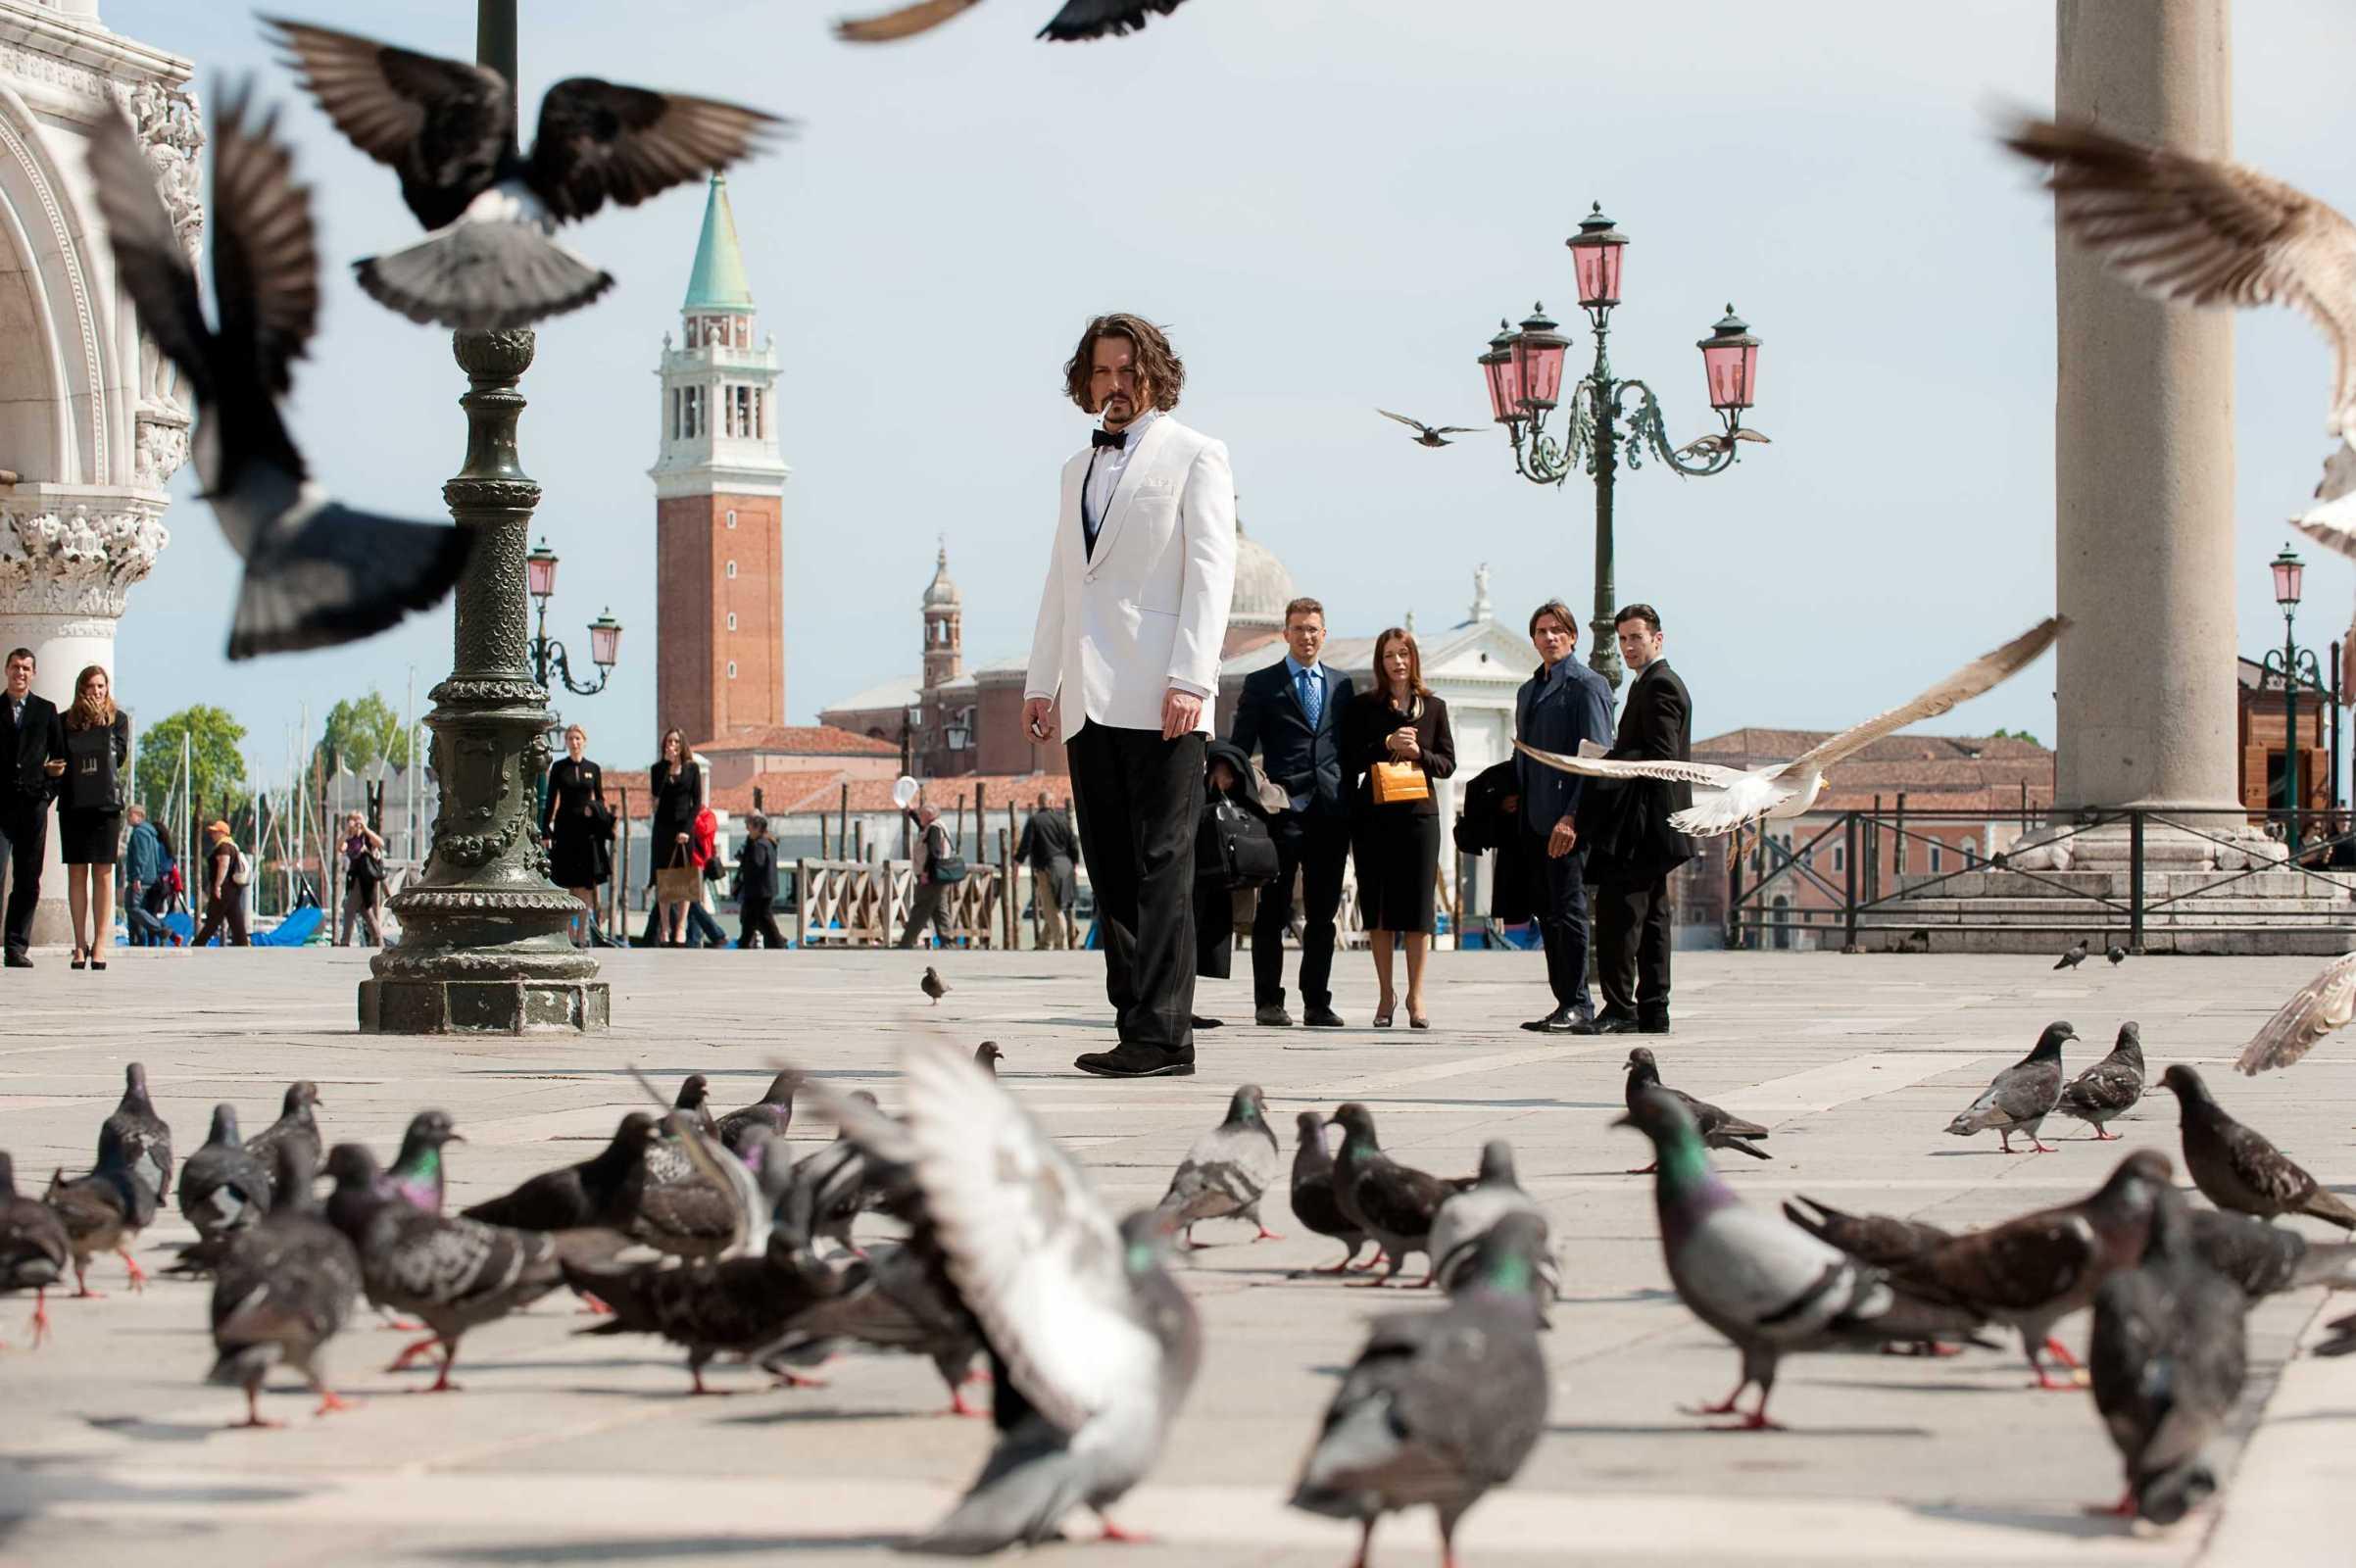 2010 the tourist 005